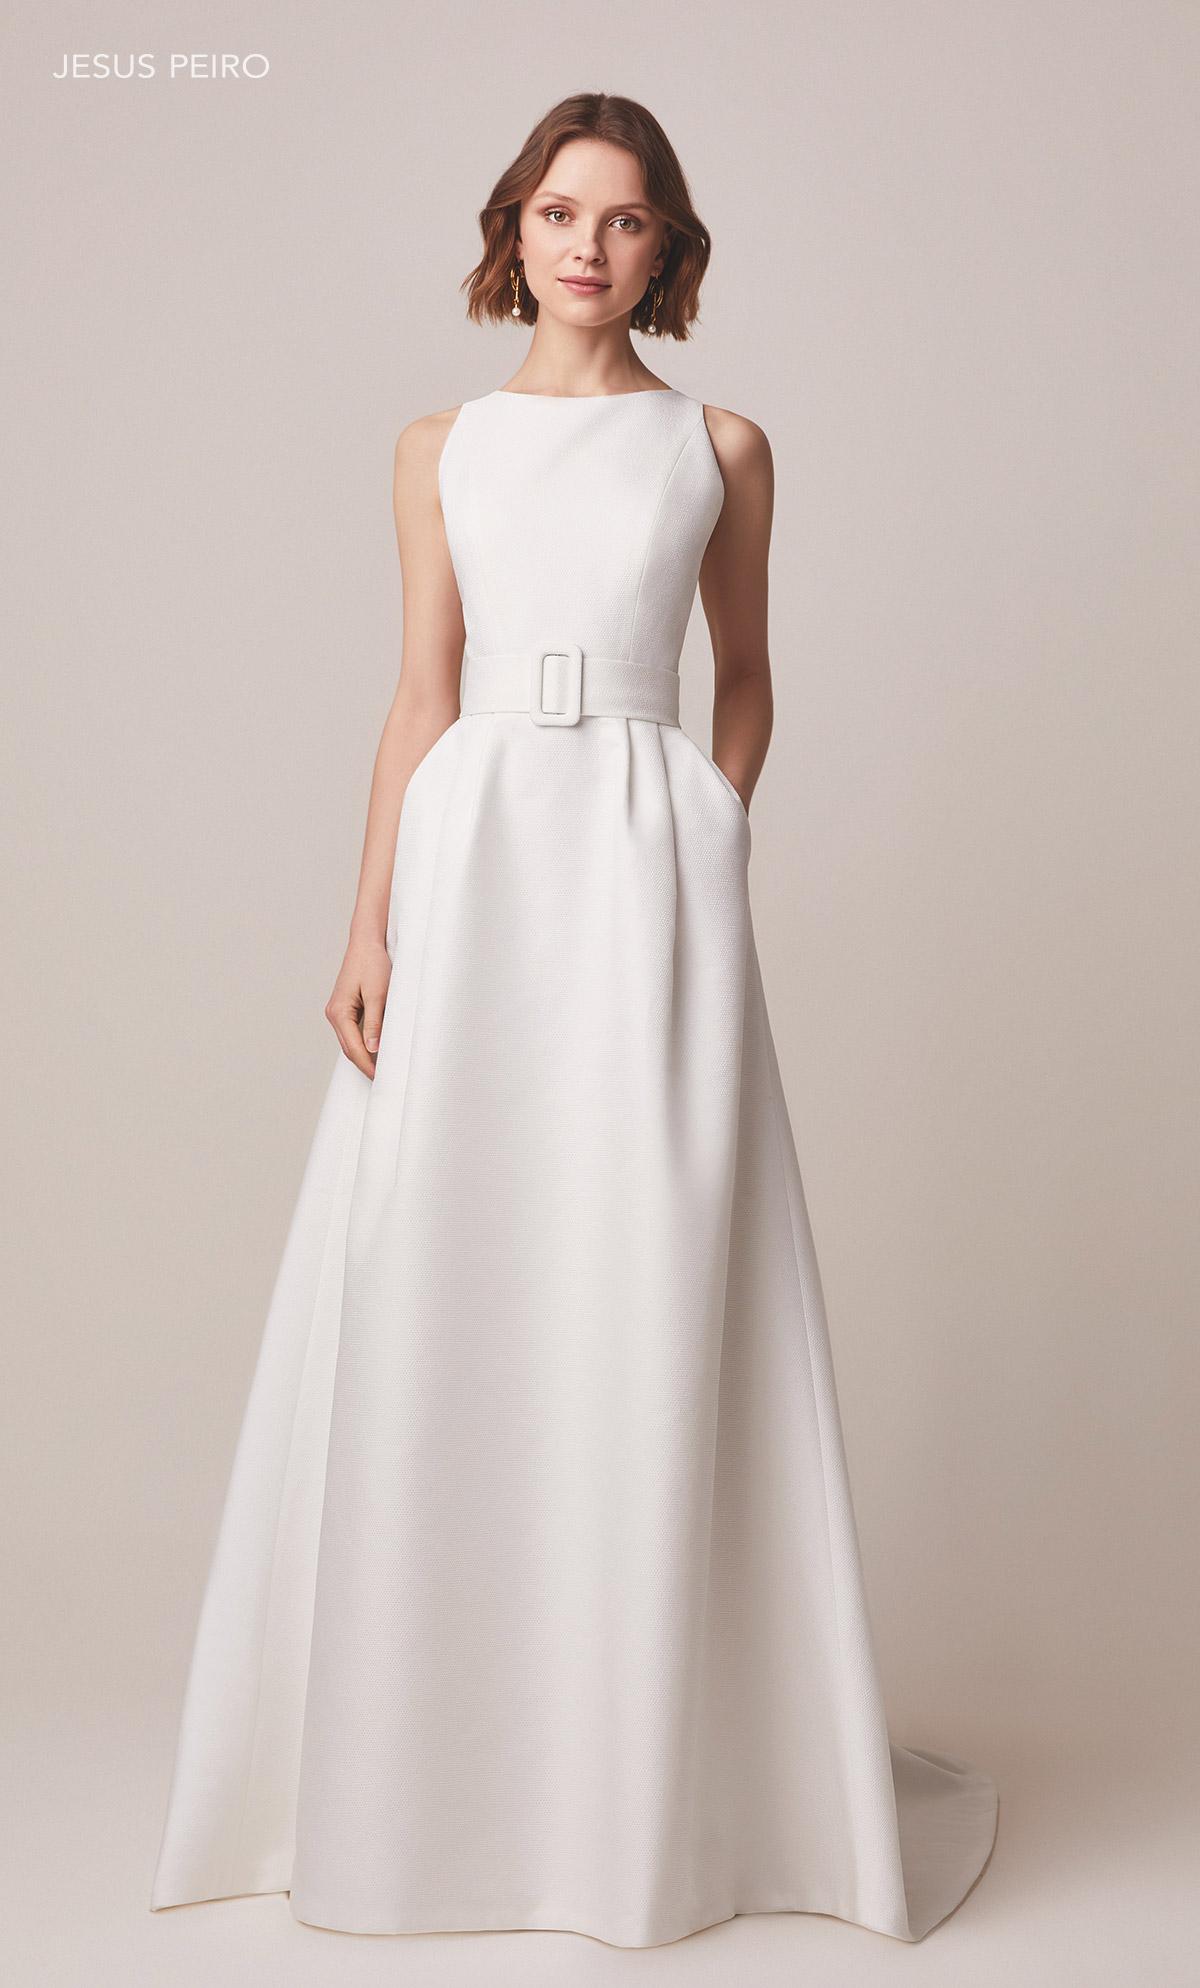 Vestido novia Jesús Peiró Ref.119